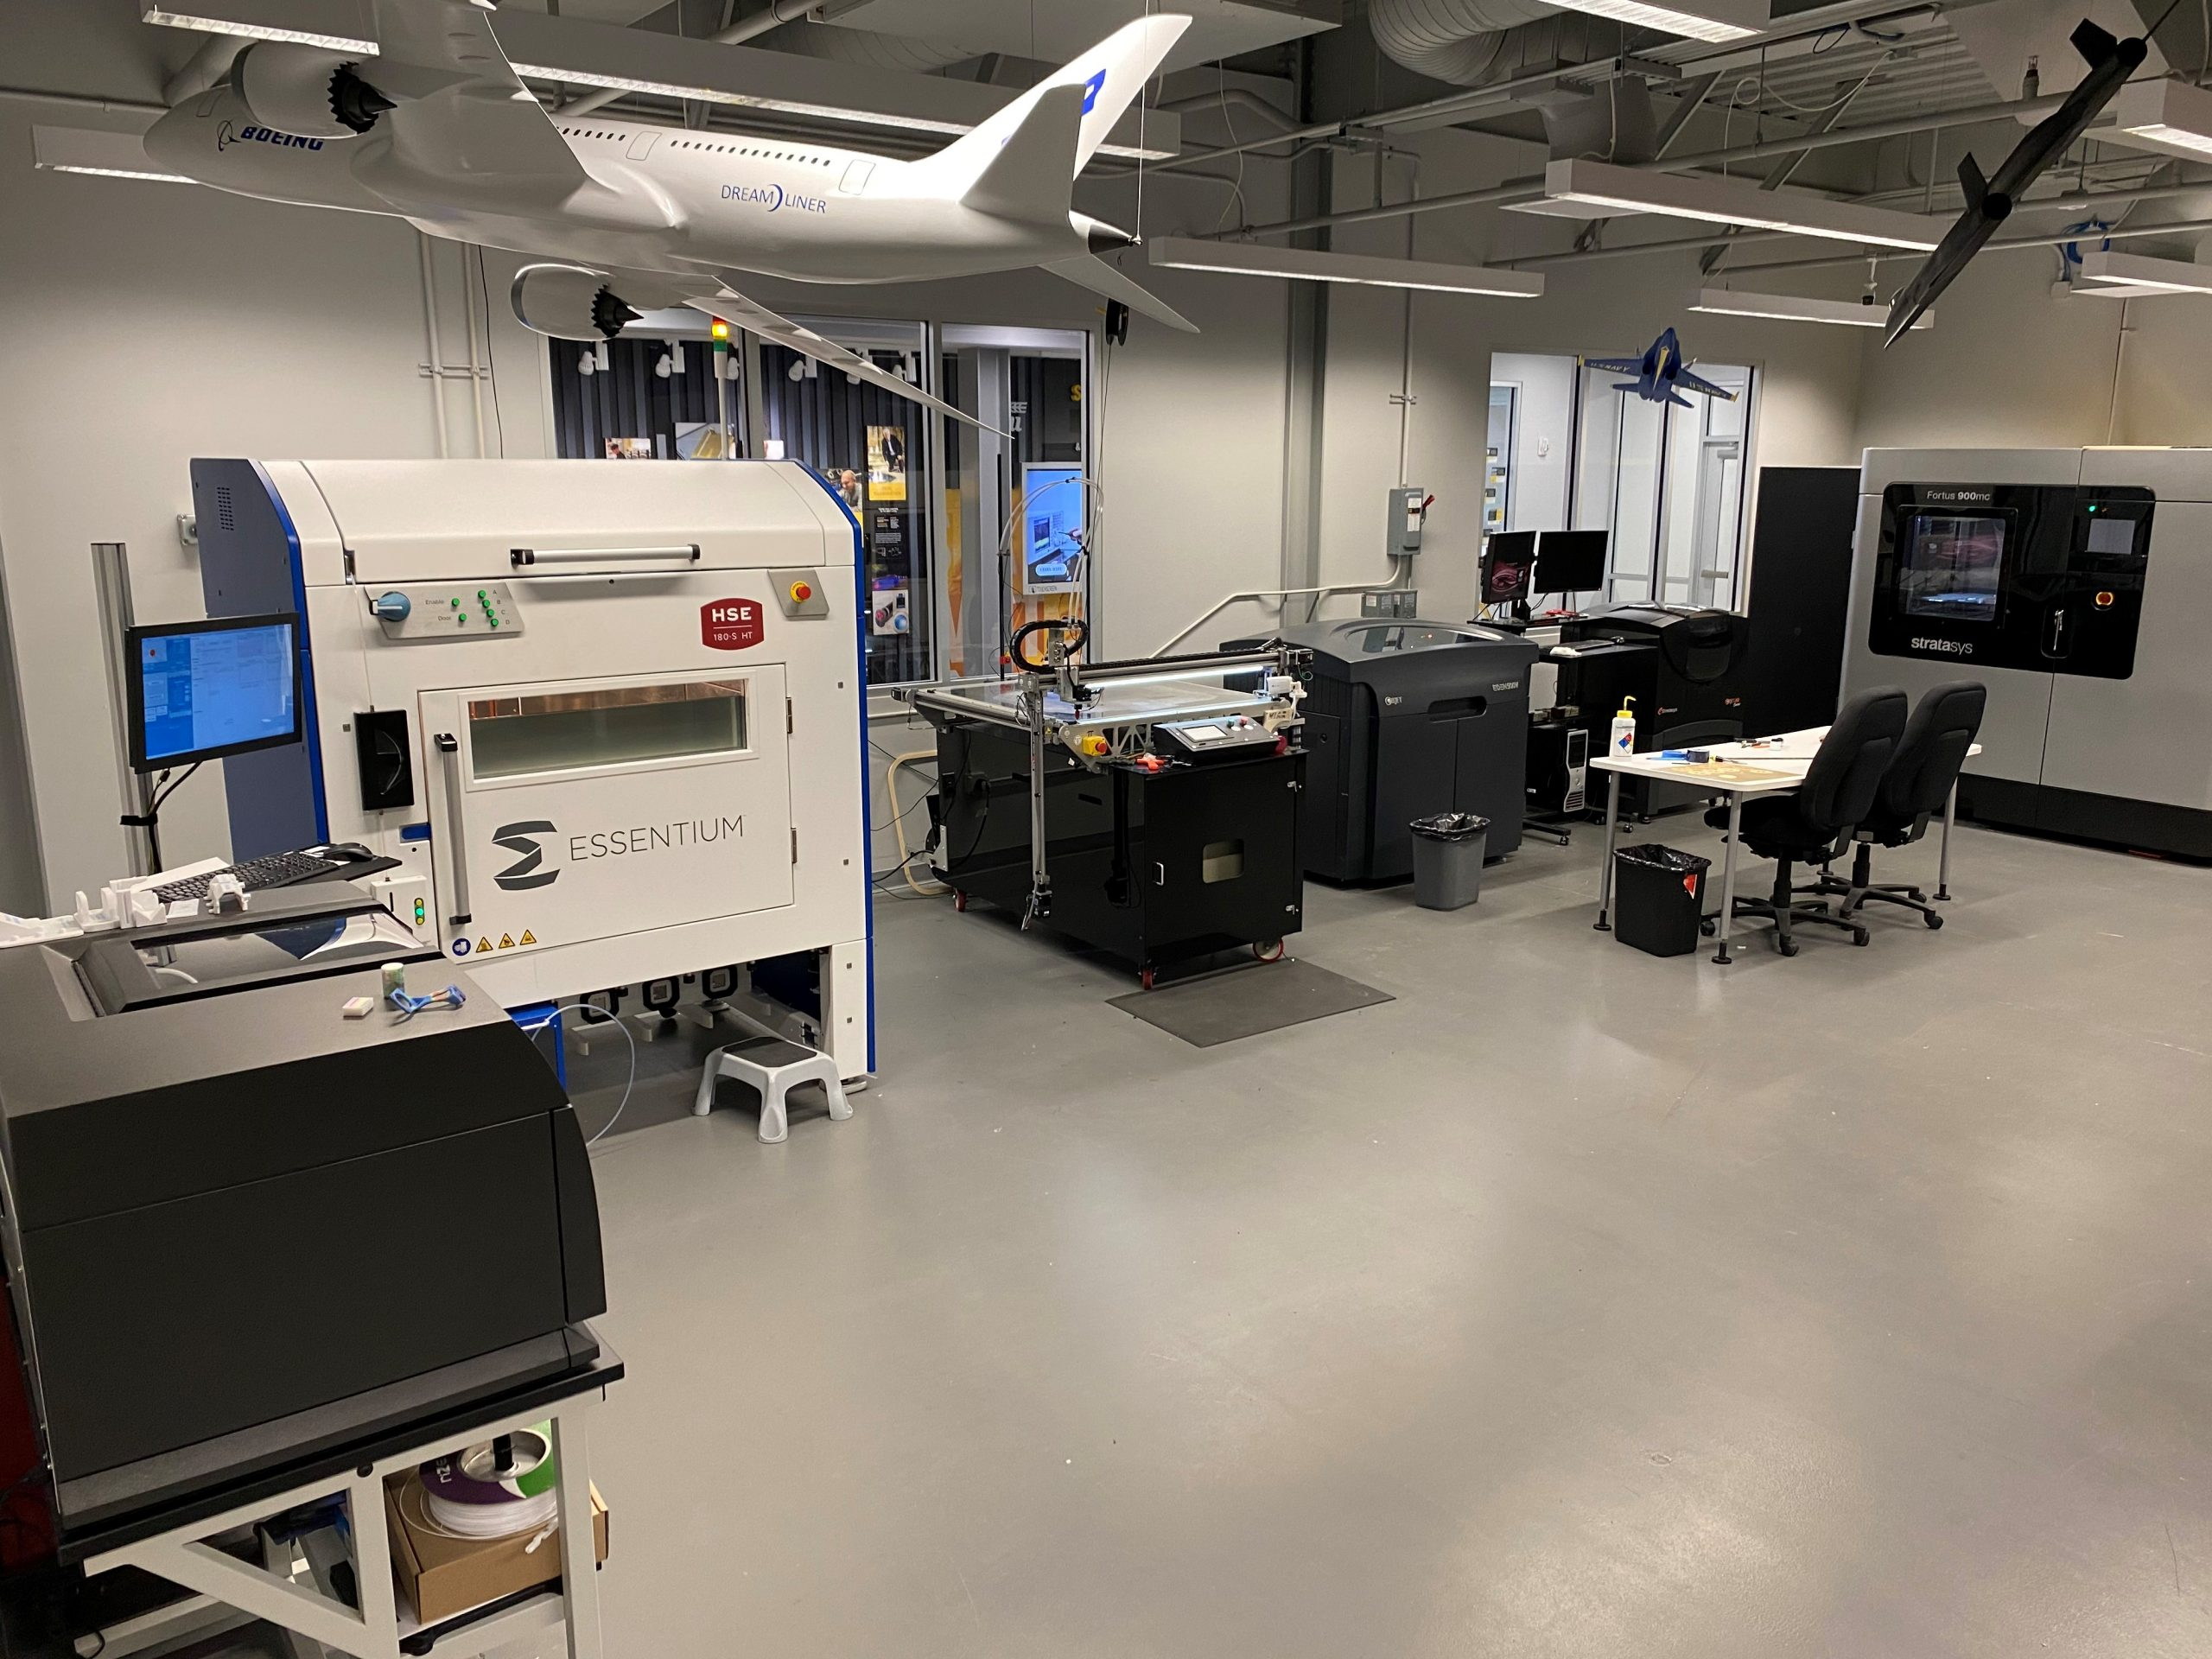 The Essentium HSE platform installed NIAR's facility. Photo via Essentium.